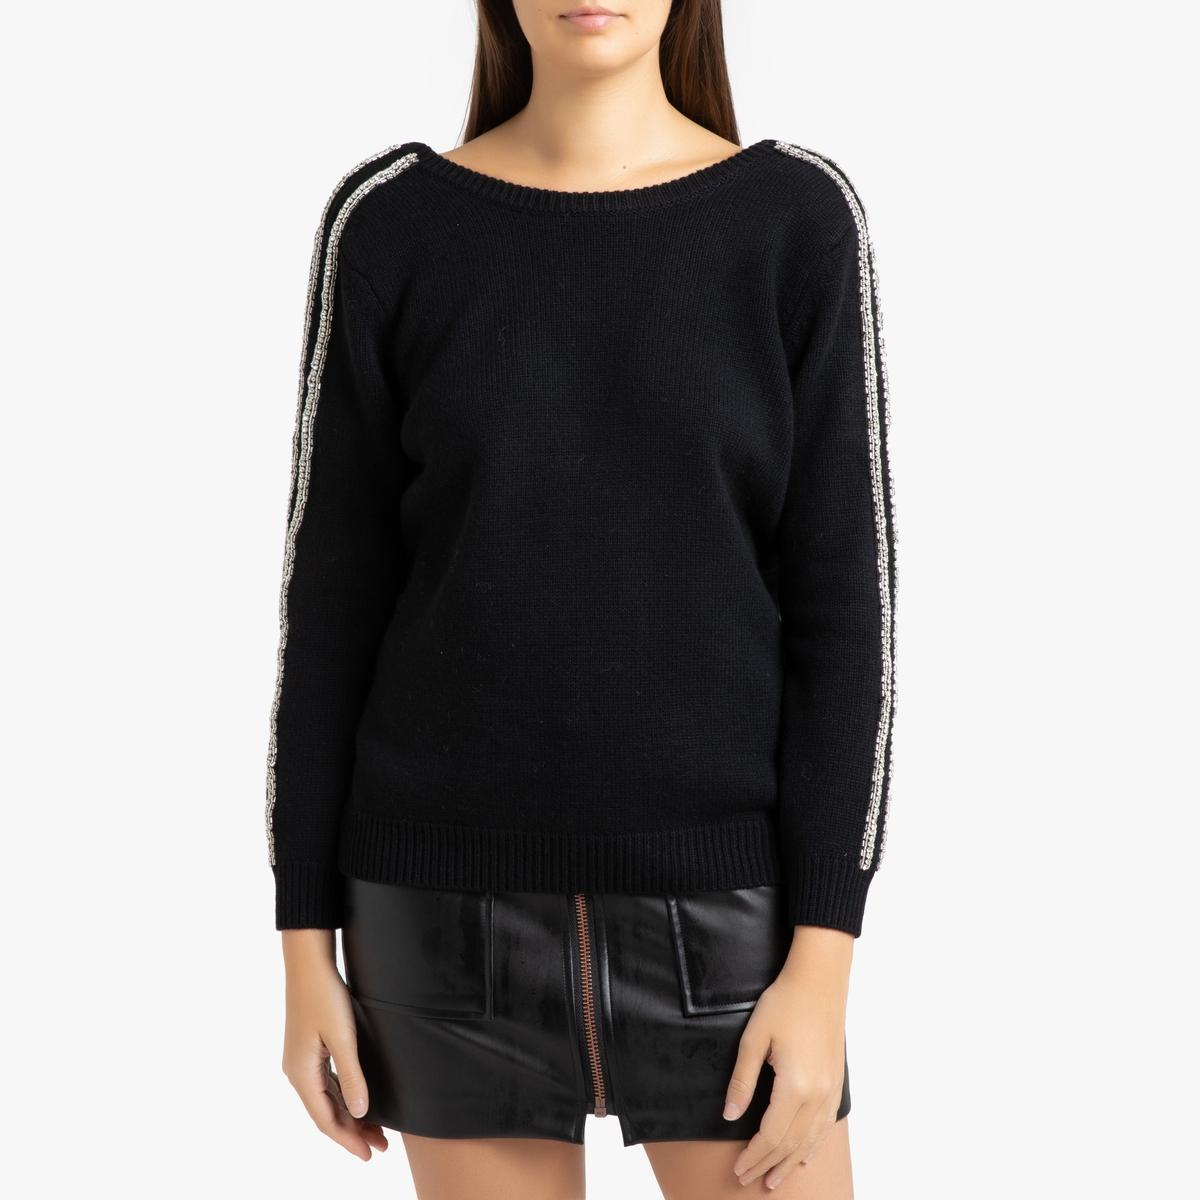 Пуловер La Redoute Со стразами на рукавах DELHIA 2(M) черный